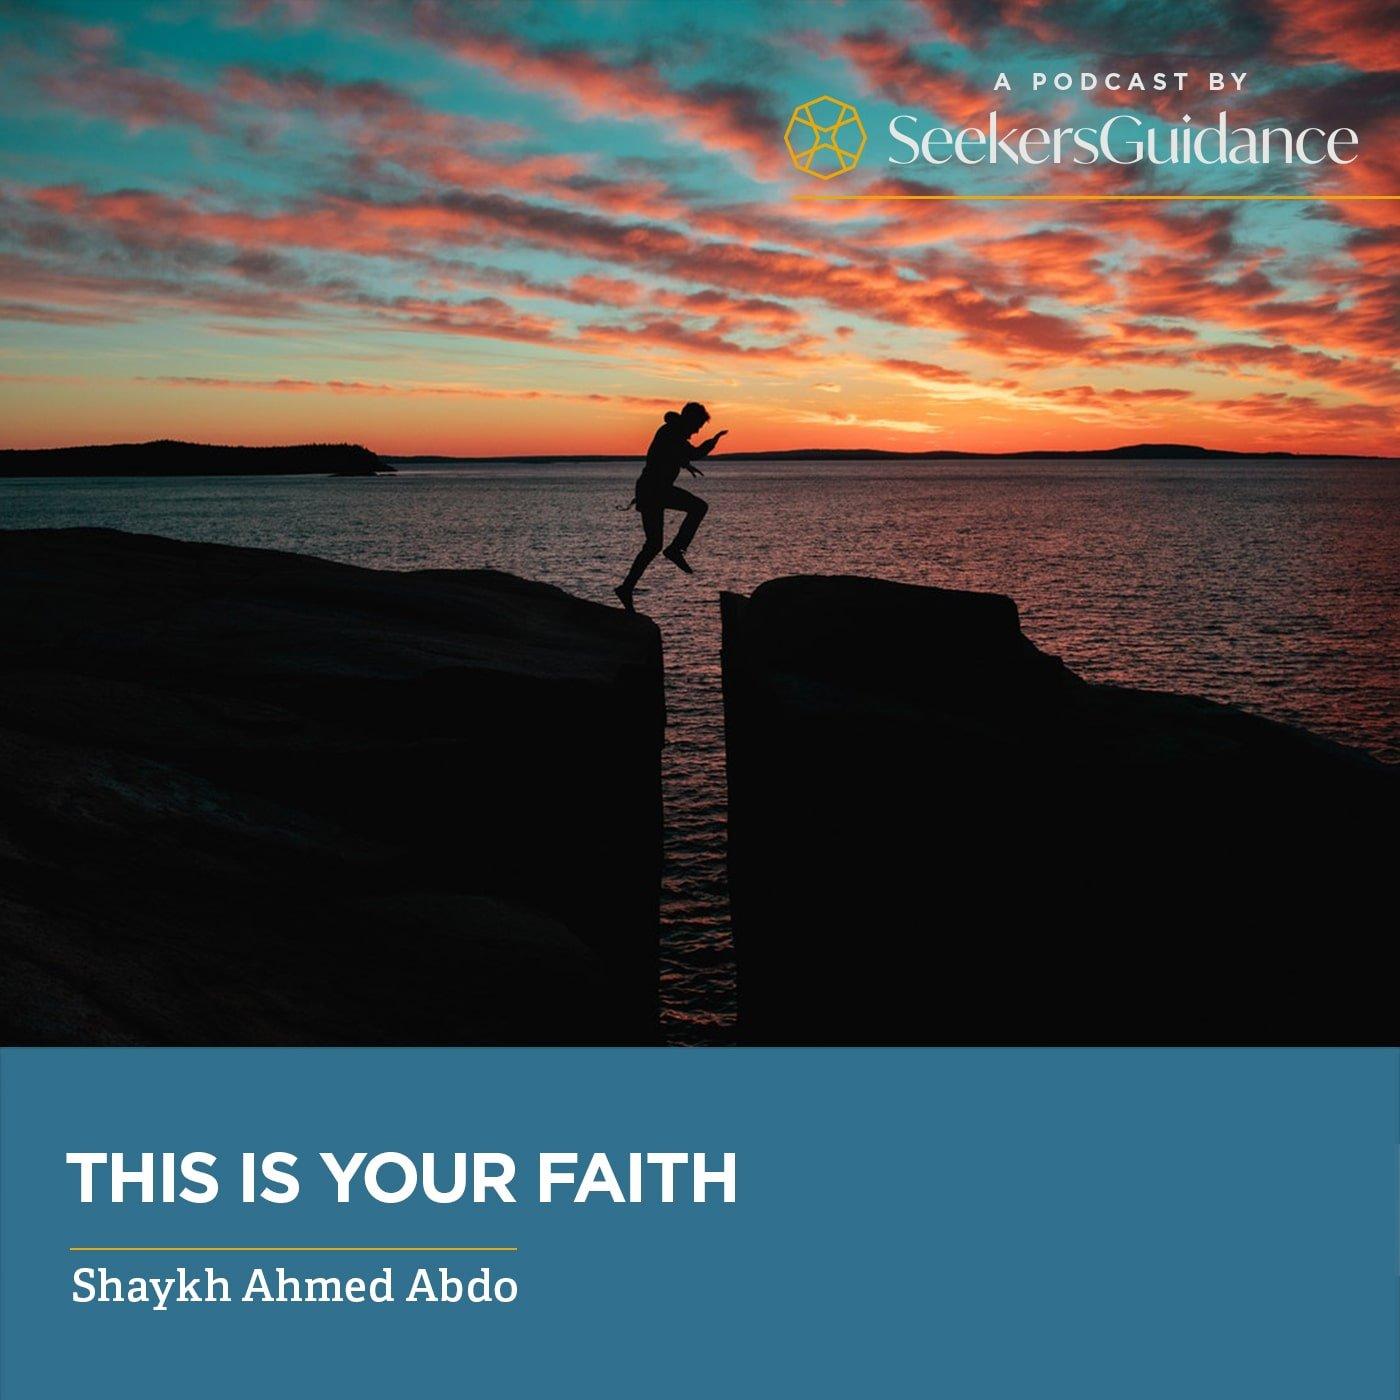 This is Your Faith with Shaykh Ahmed Abdo